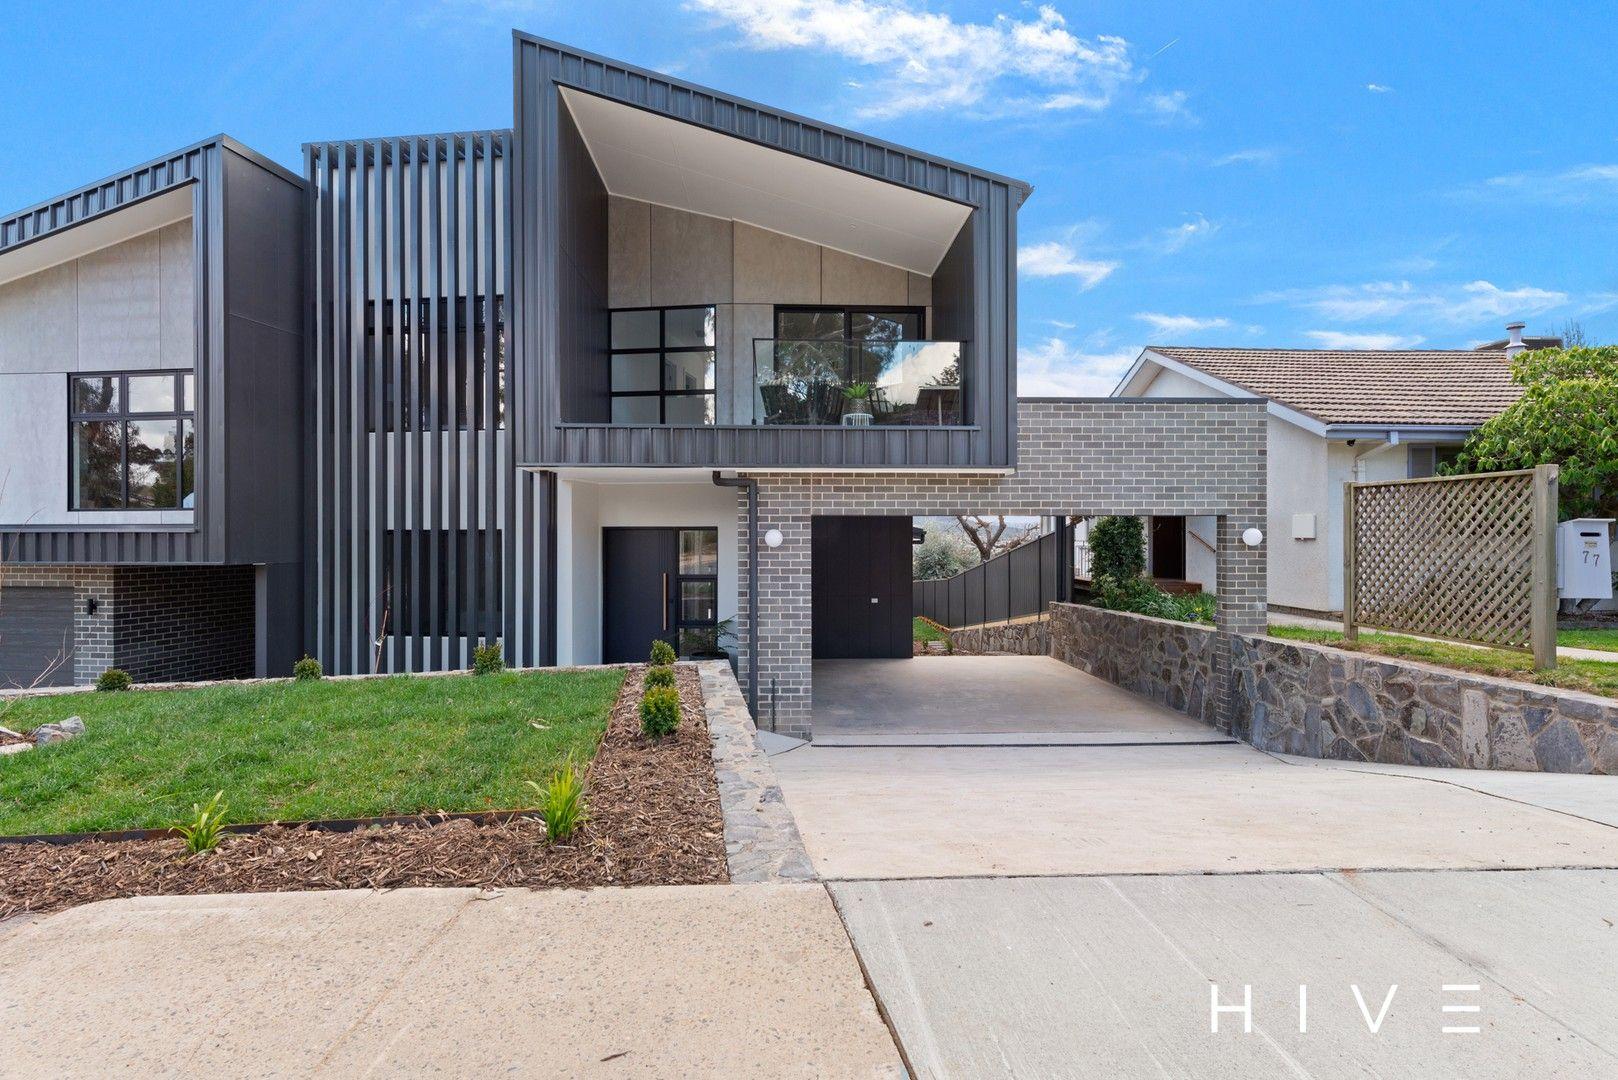 2/75 Hilder Street, Weston ACT 2611, Image 0